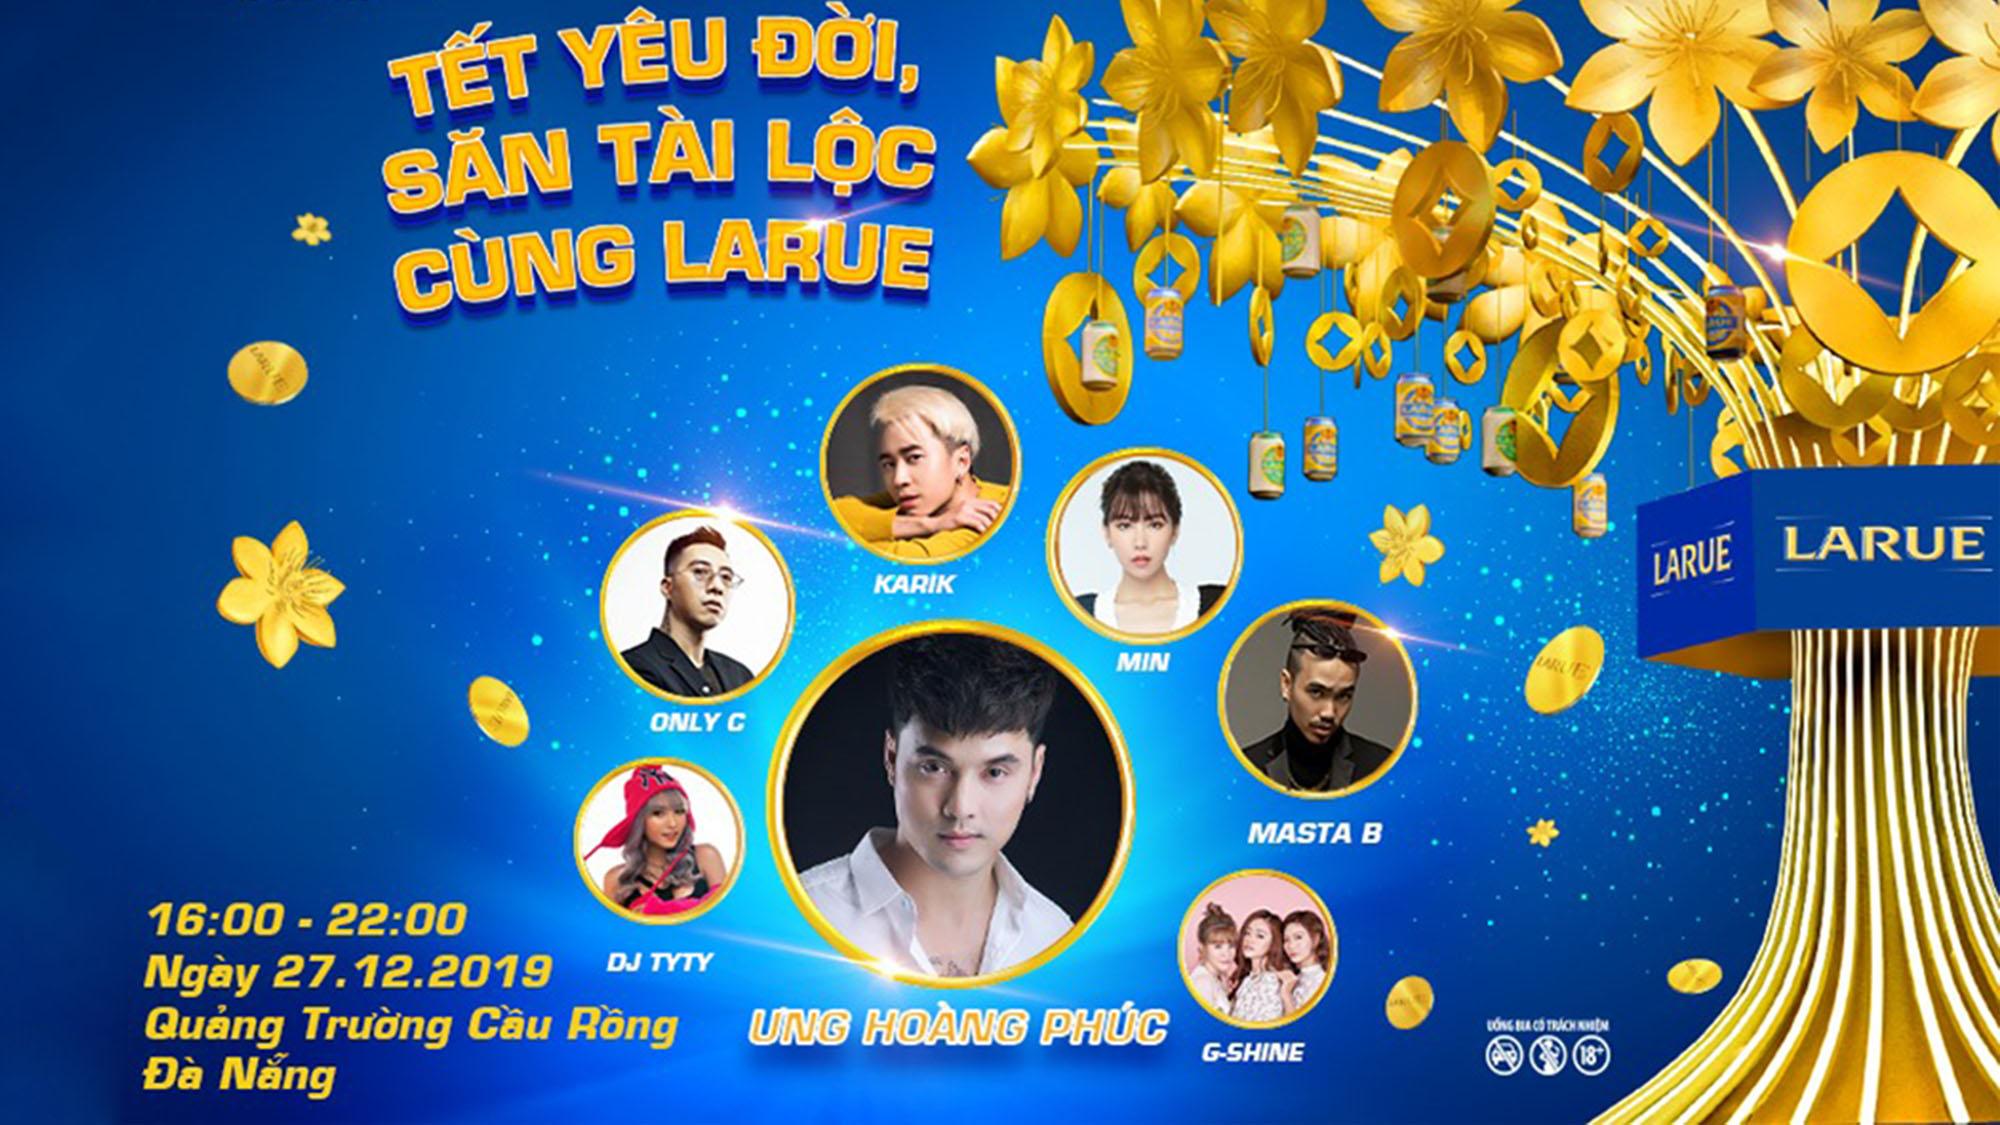 Tet Yeu Doi San Tai Loc Cung Larue